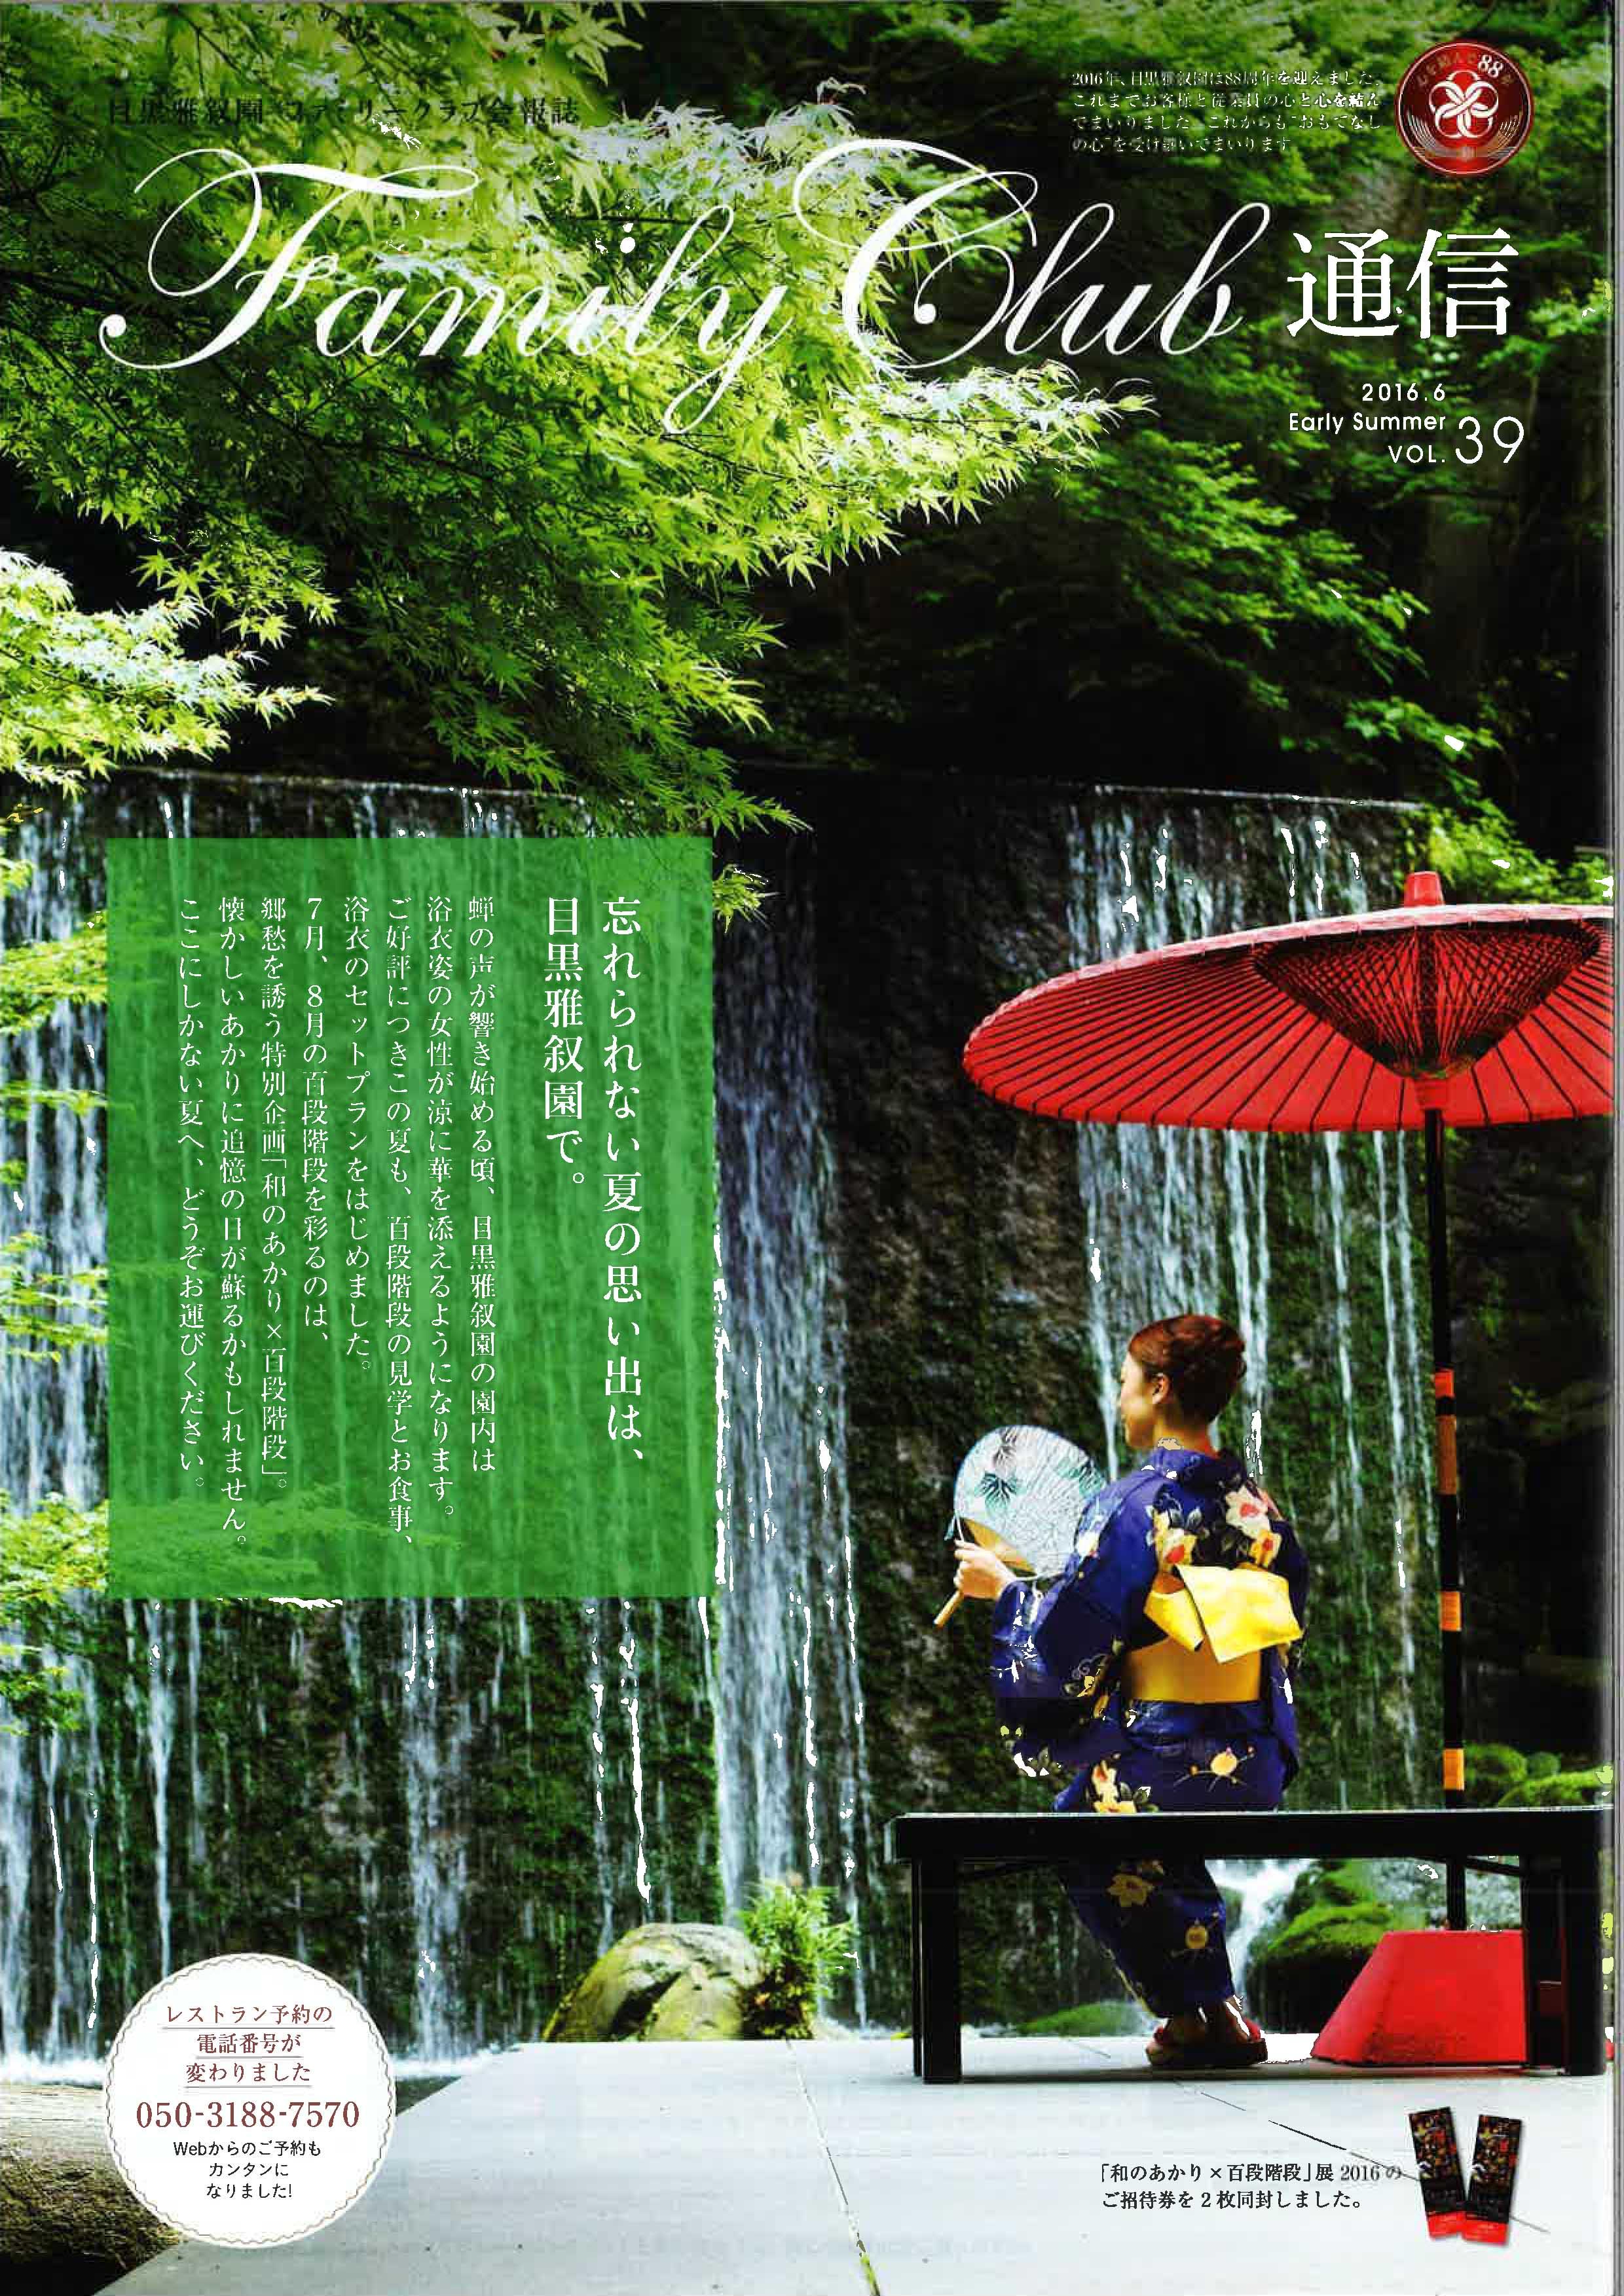 「Family Club 通信」2016.6 Spring VOL.39